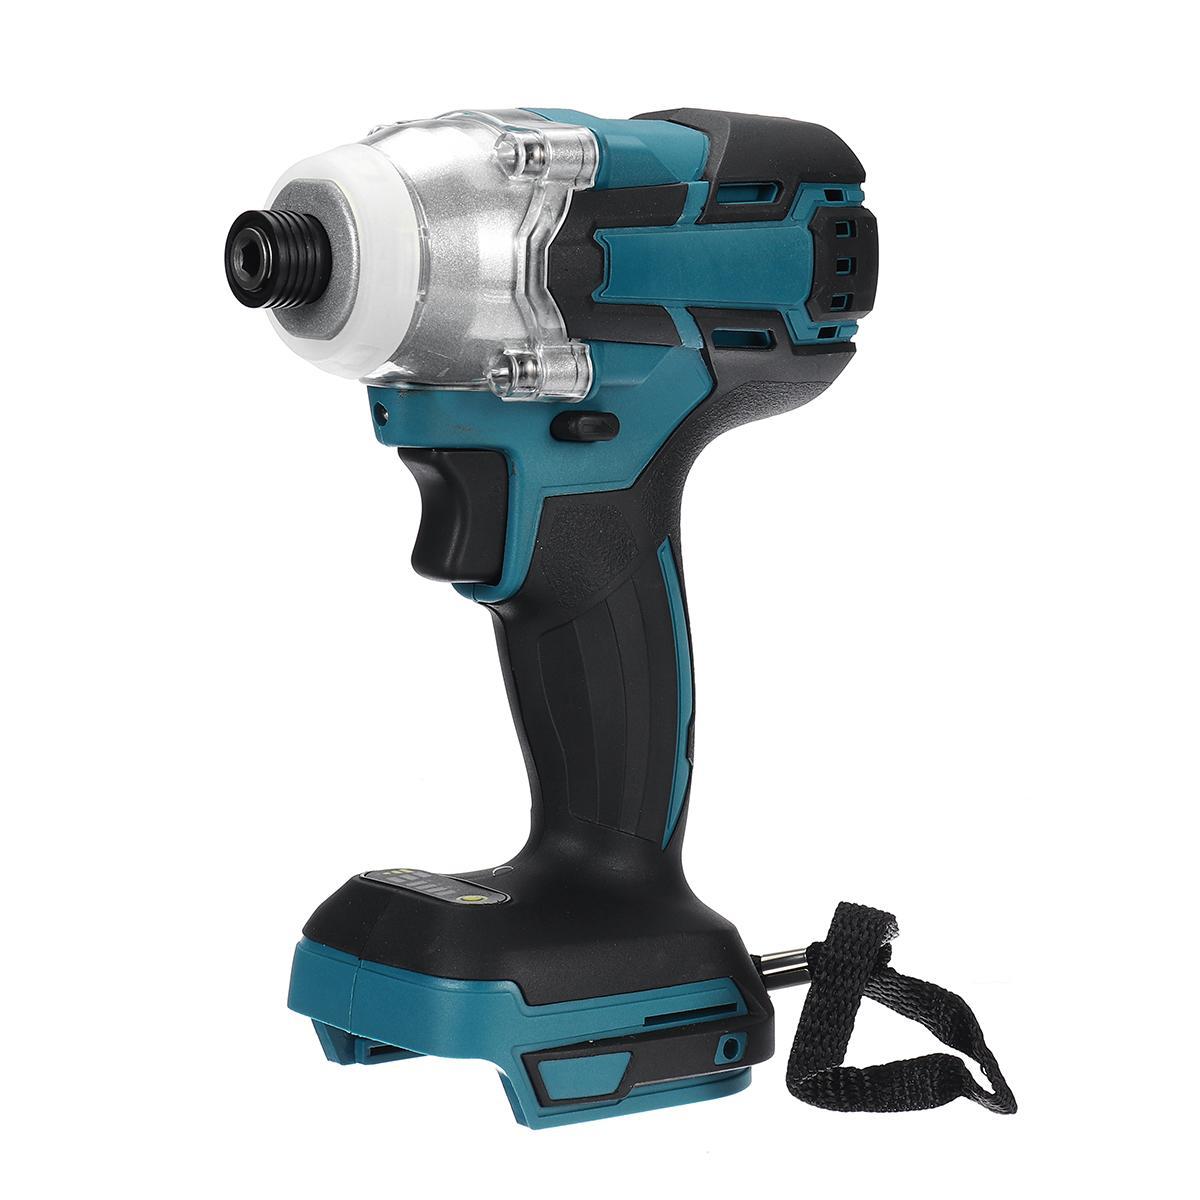 18V 520N.m/280 N.m Cordless Electric Impact Wrench Motor 1/2